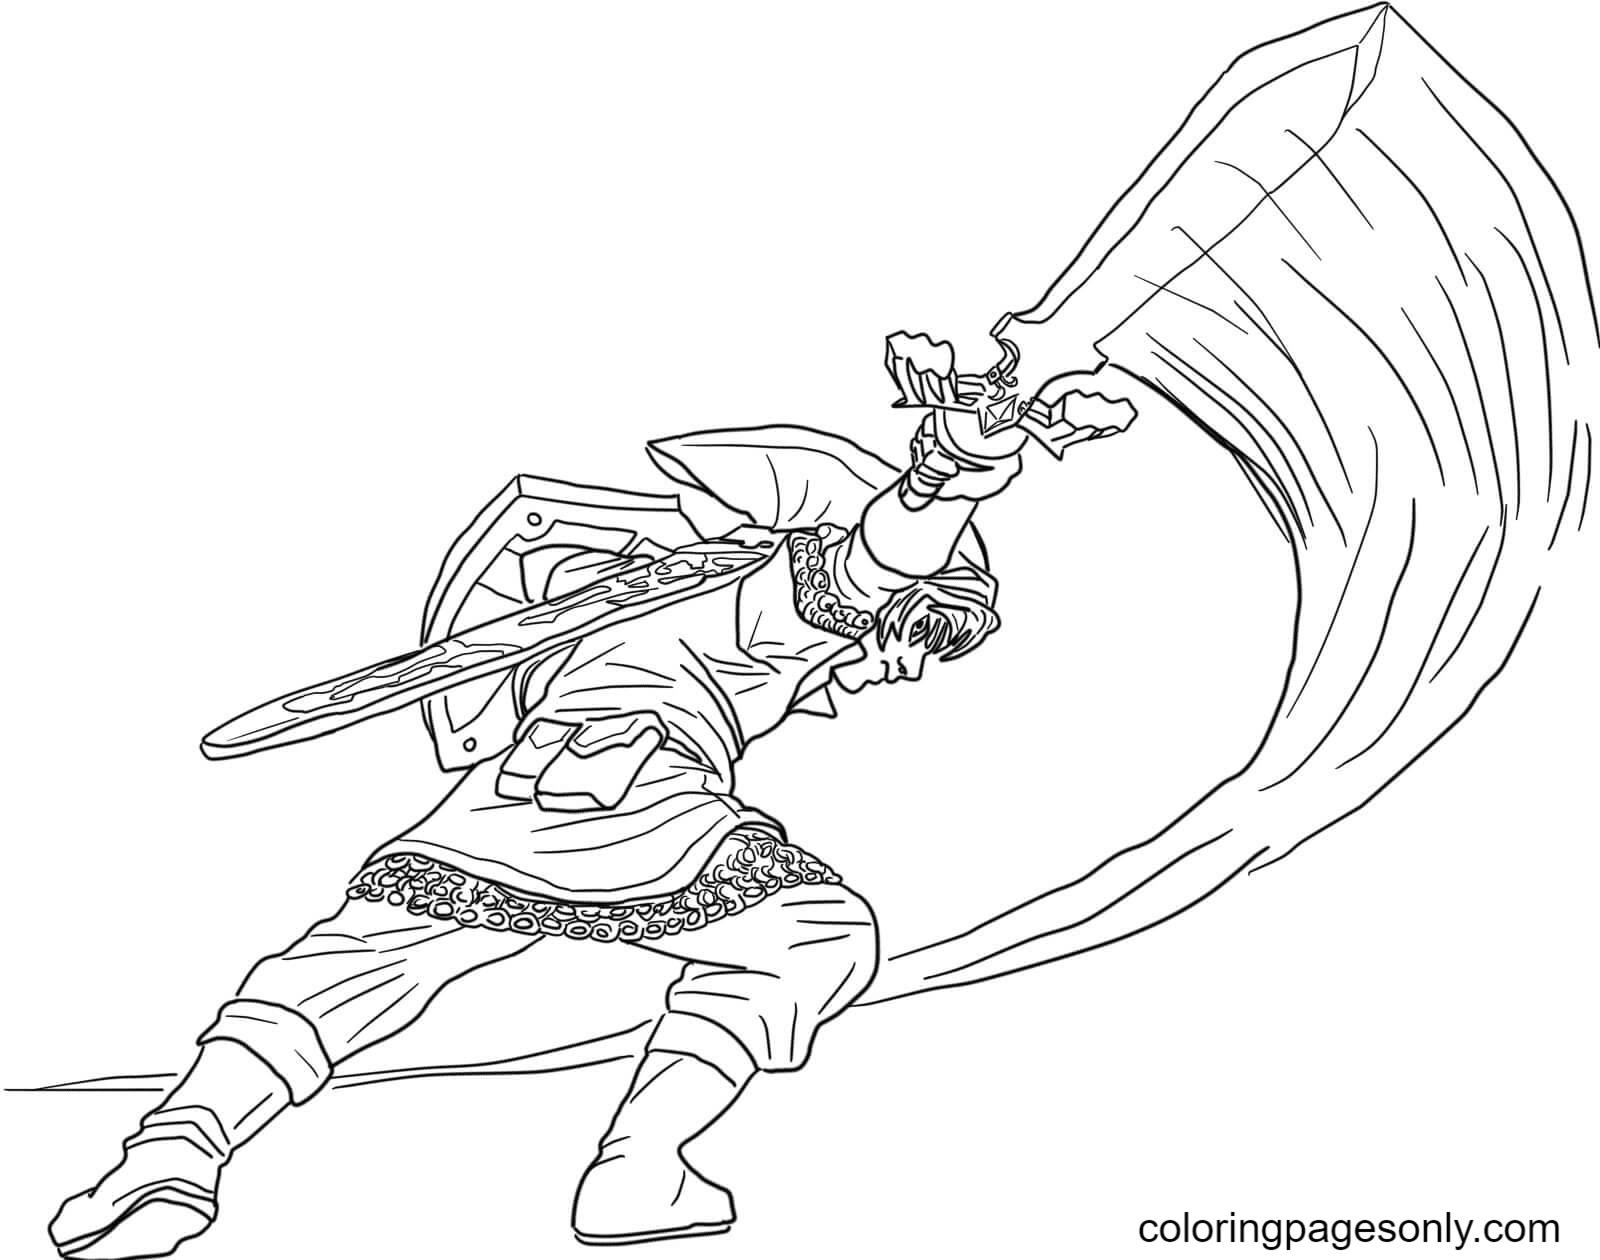 The Legend of Zelda Skyward Sword Coloring Page